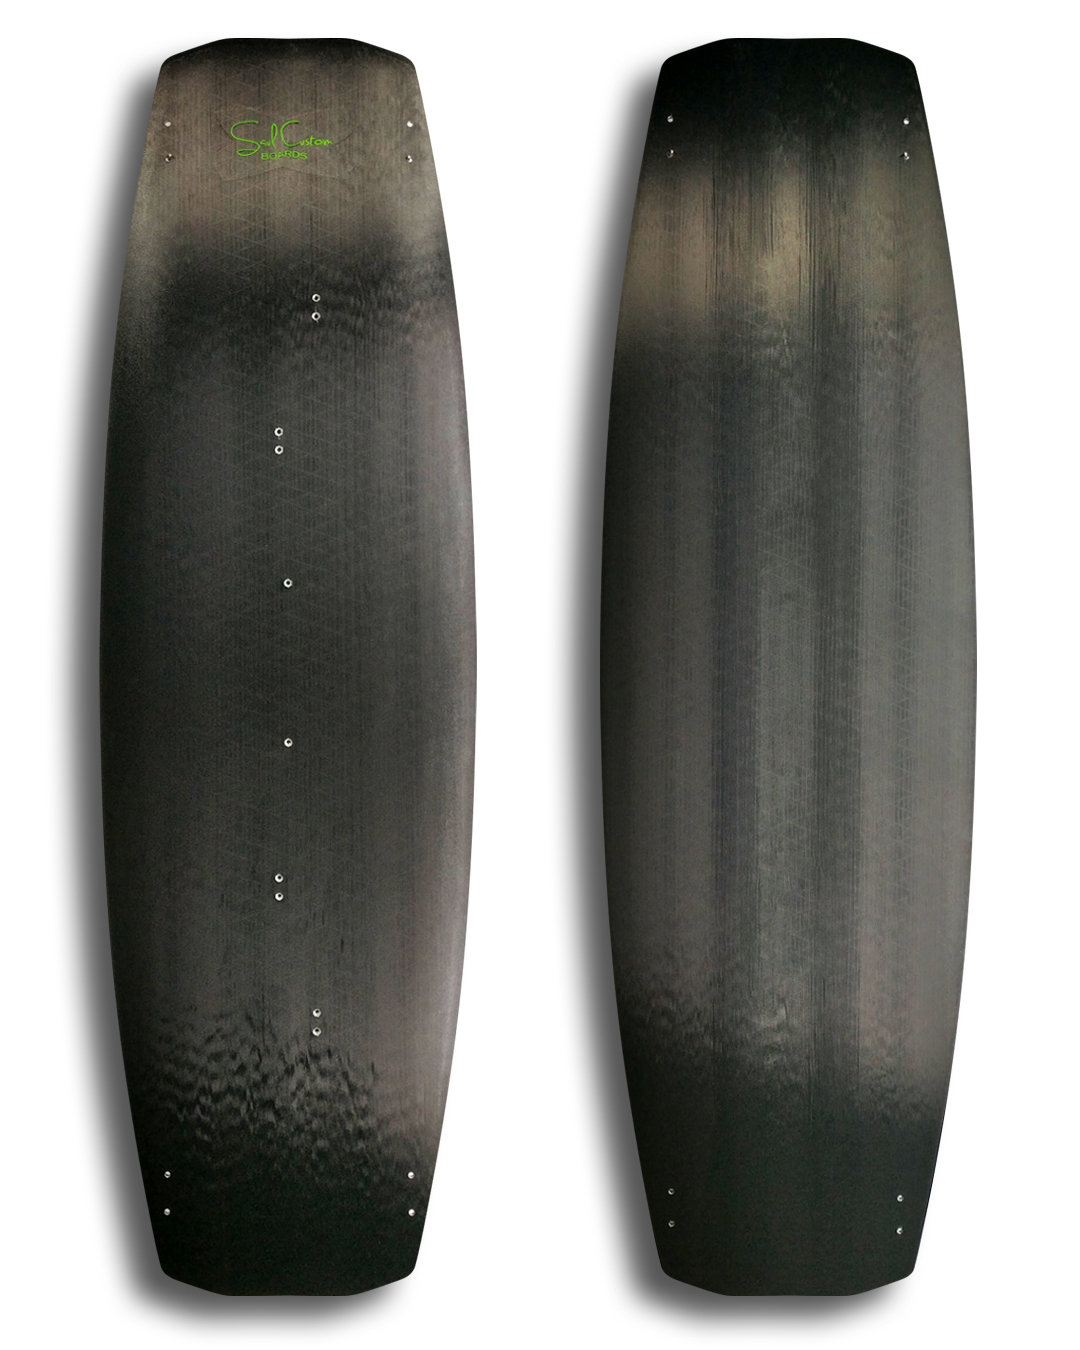 Standard 2.0 Carbon kiteboard